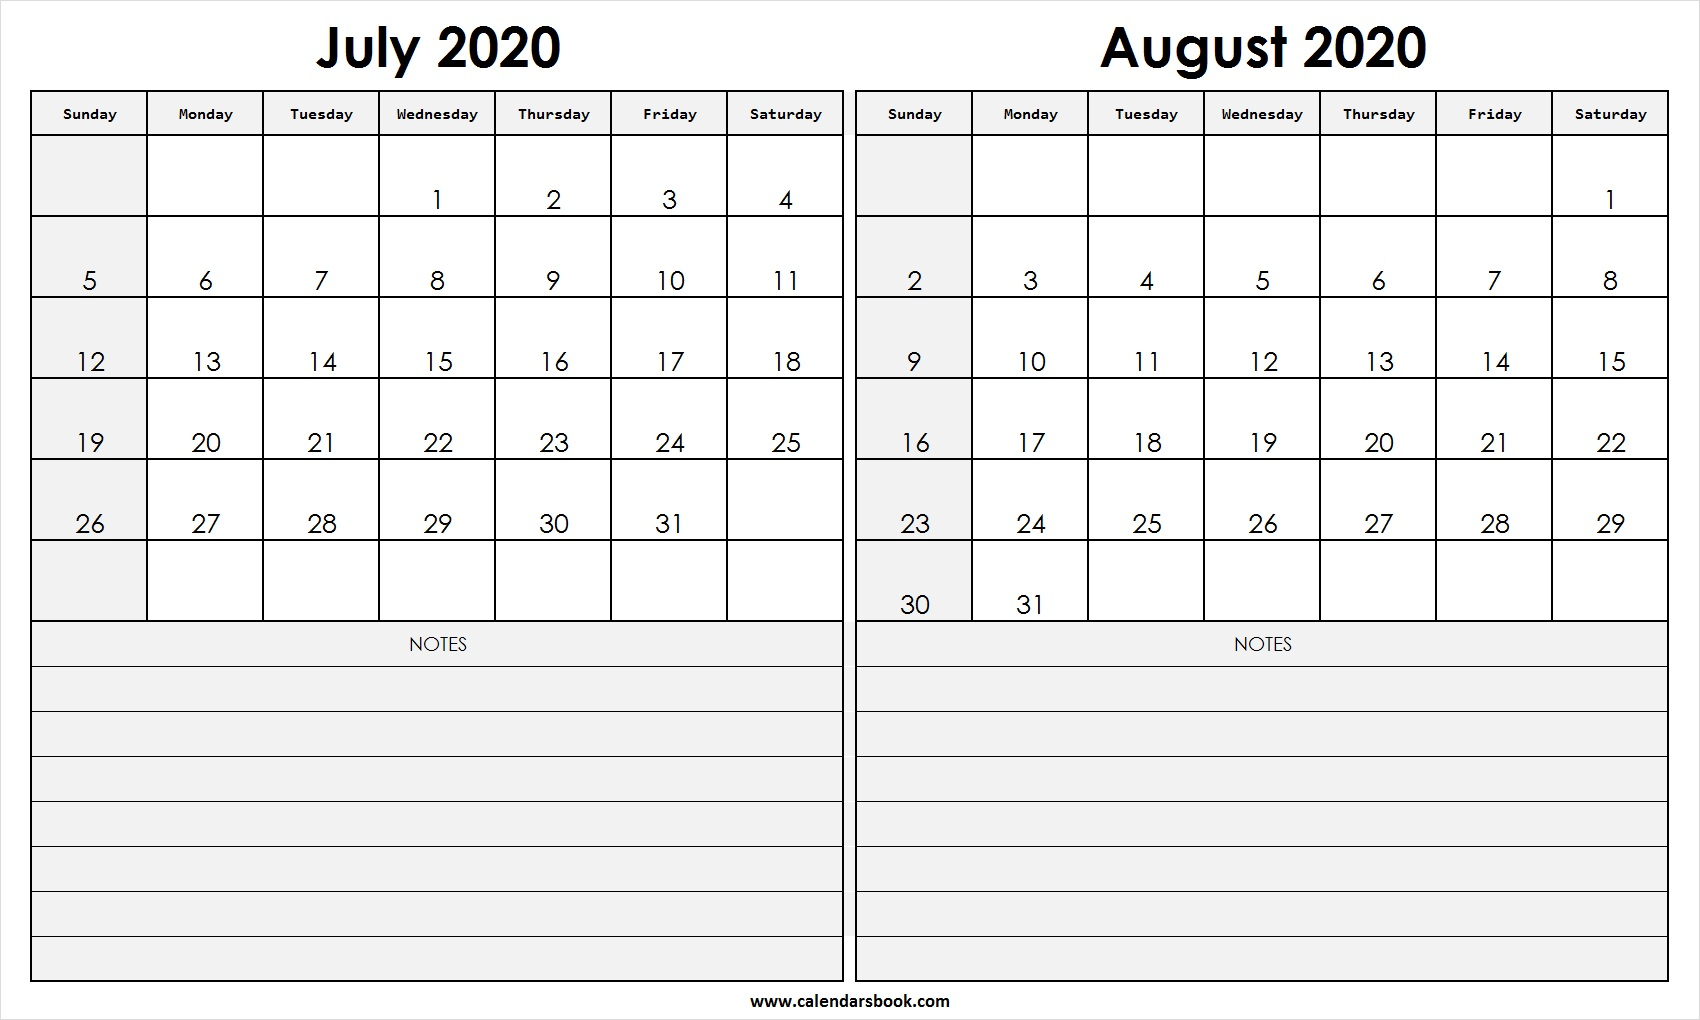 Print July August 2020 Calendar Template | 2 Month Calendar regarding June July August 2020 Calendar